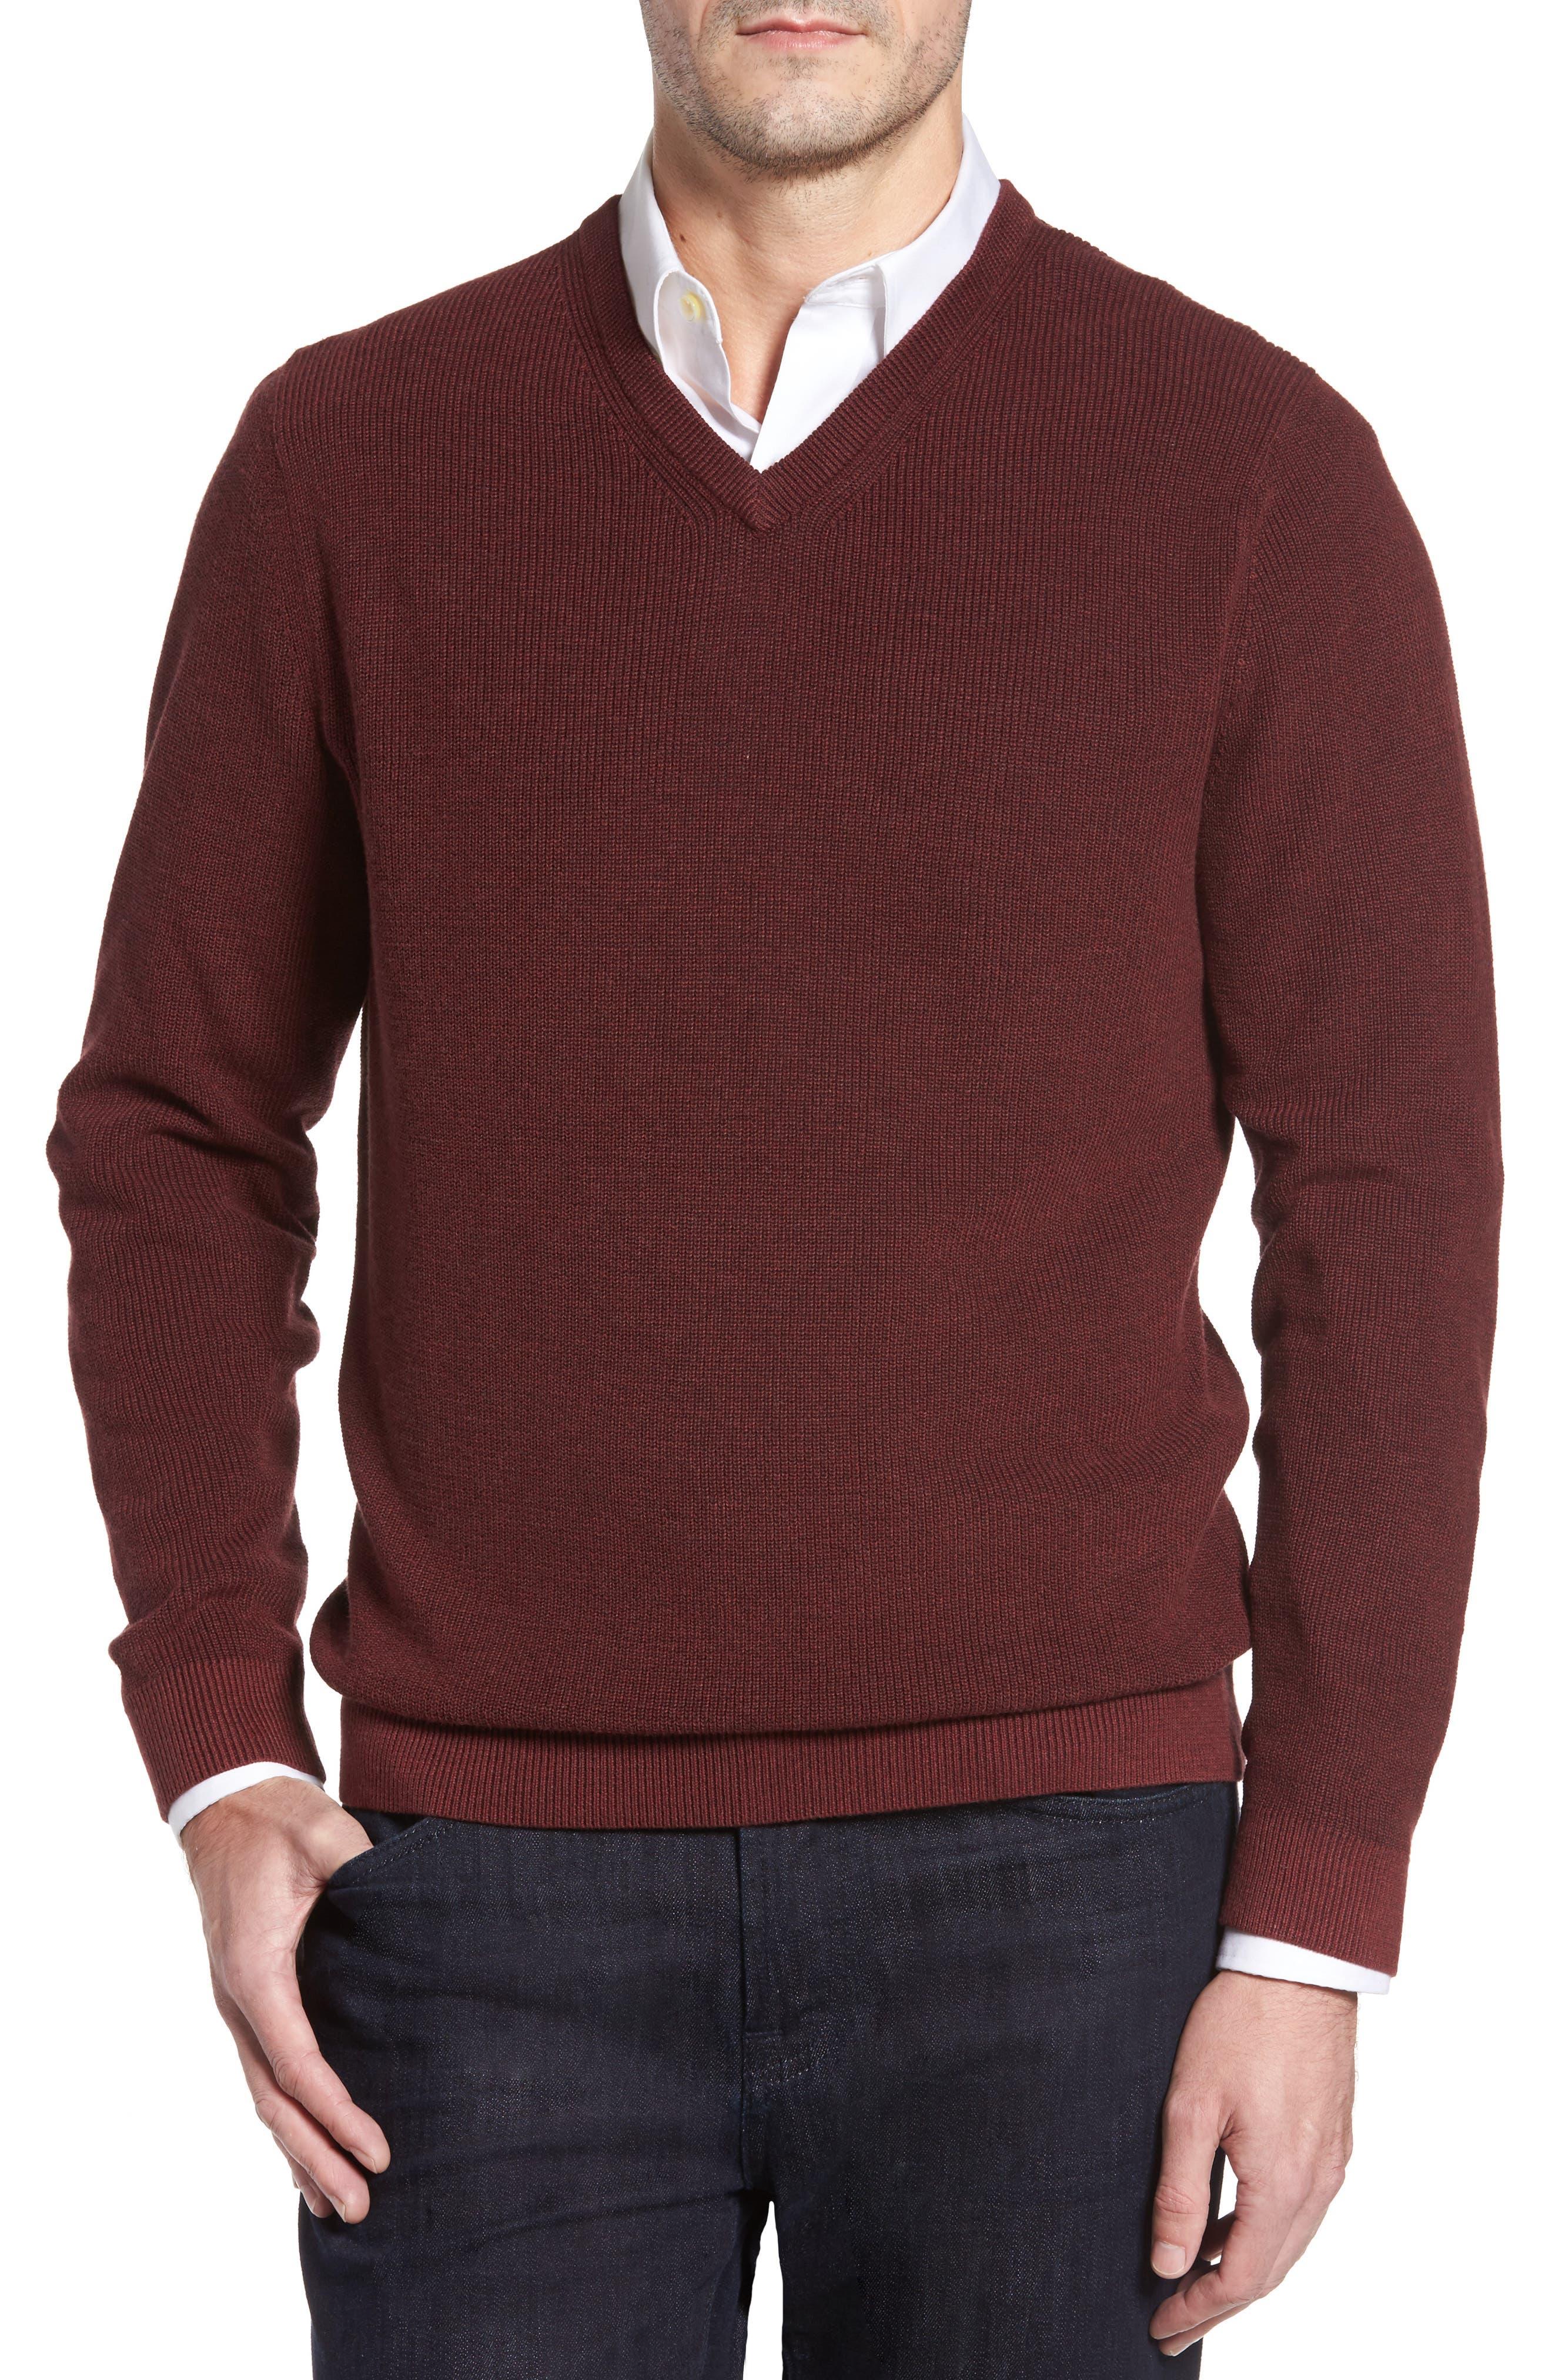 Tommy Bahama Las Palmas Reversible Sweater (Big & Tall)